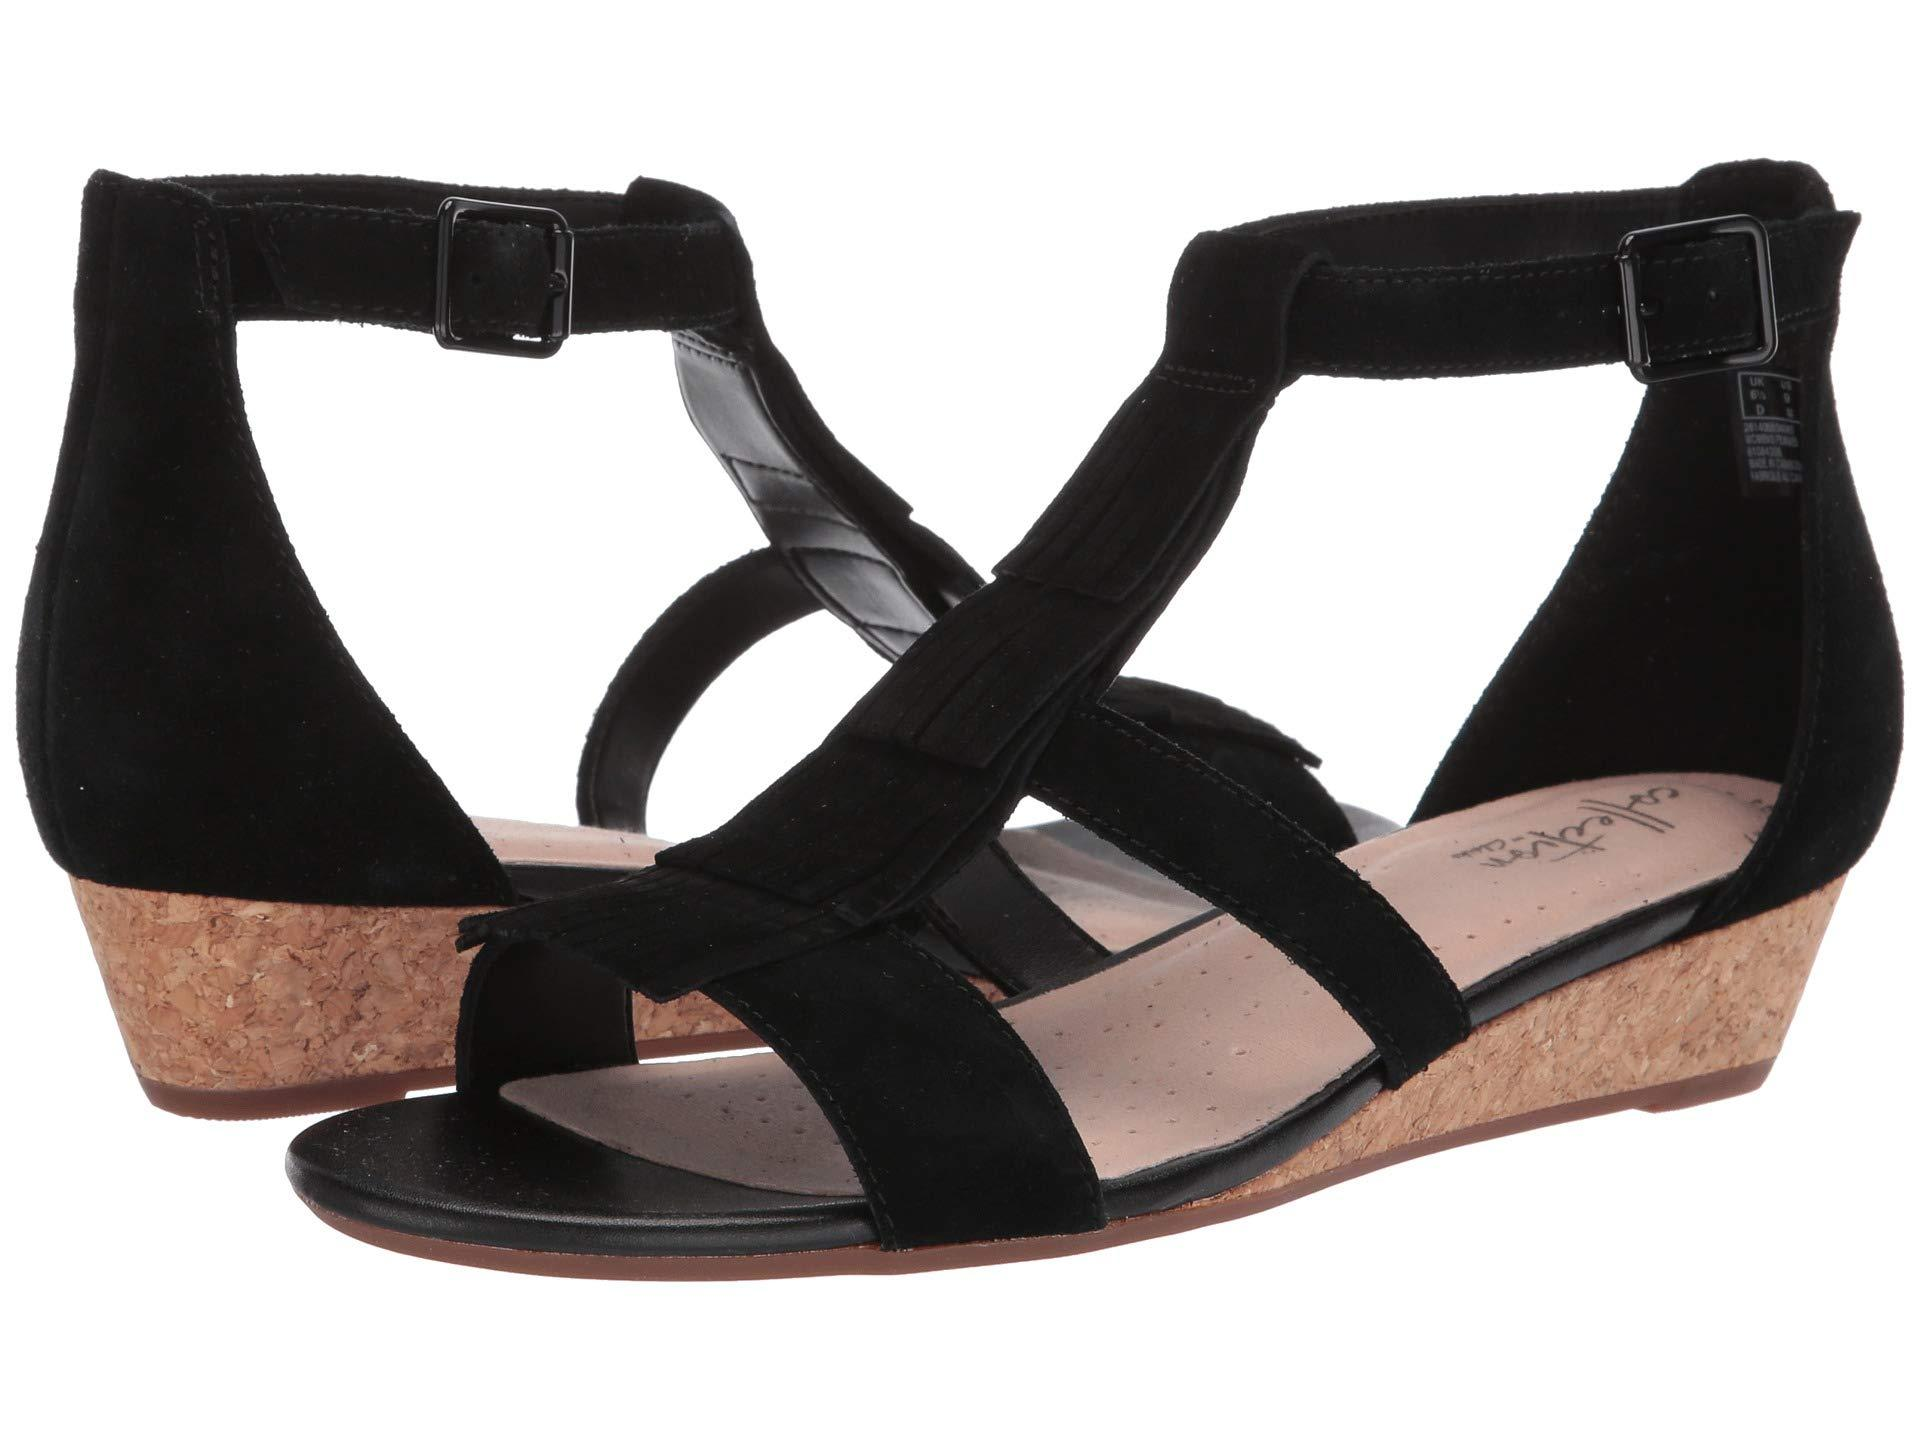 c5ef11449d5 Lyst - Clarks Abigail Sun (black Suede) Women s Wedge Shoes in Black